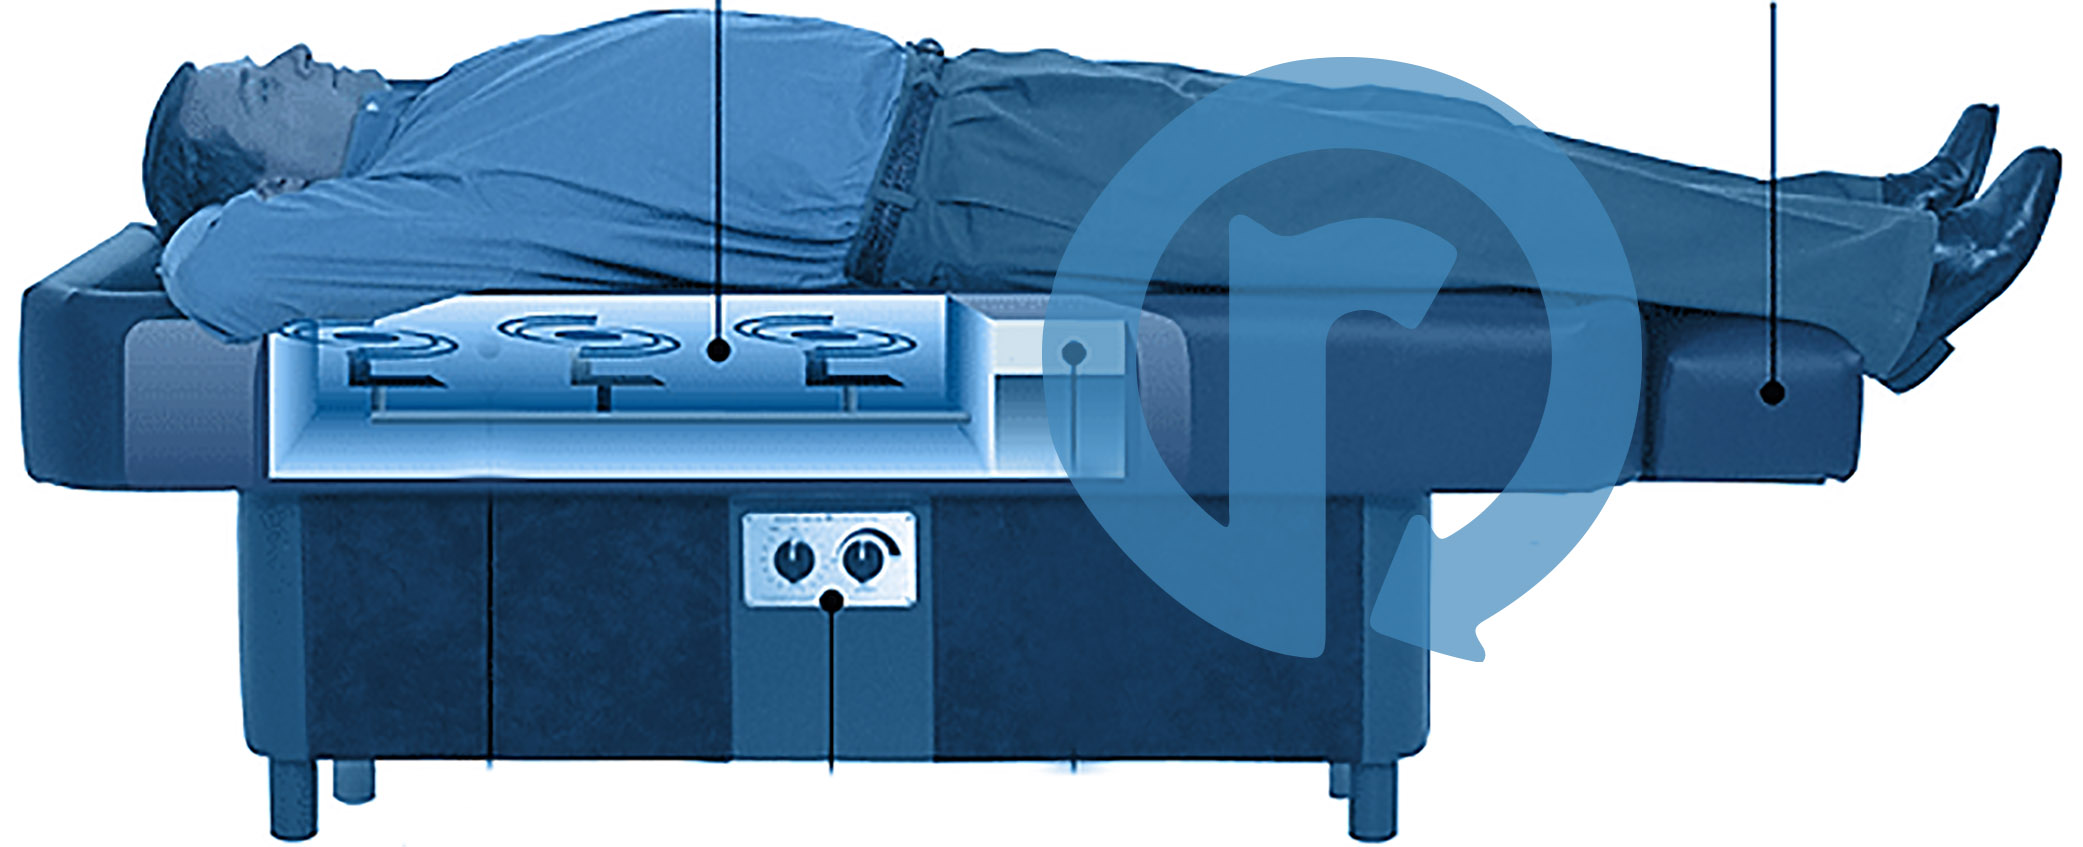 hydromassage table.jpg